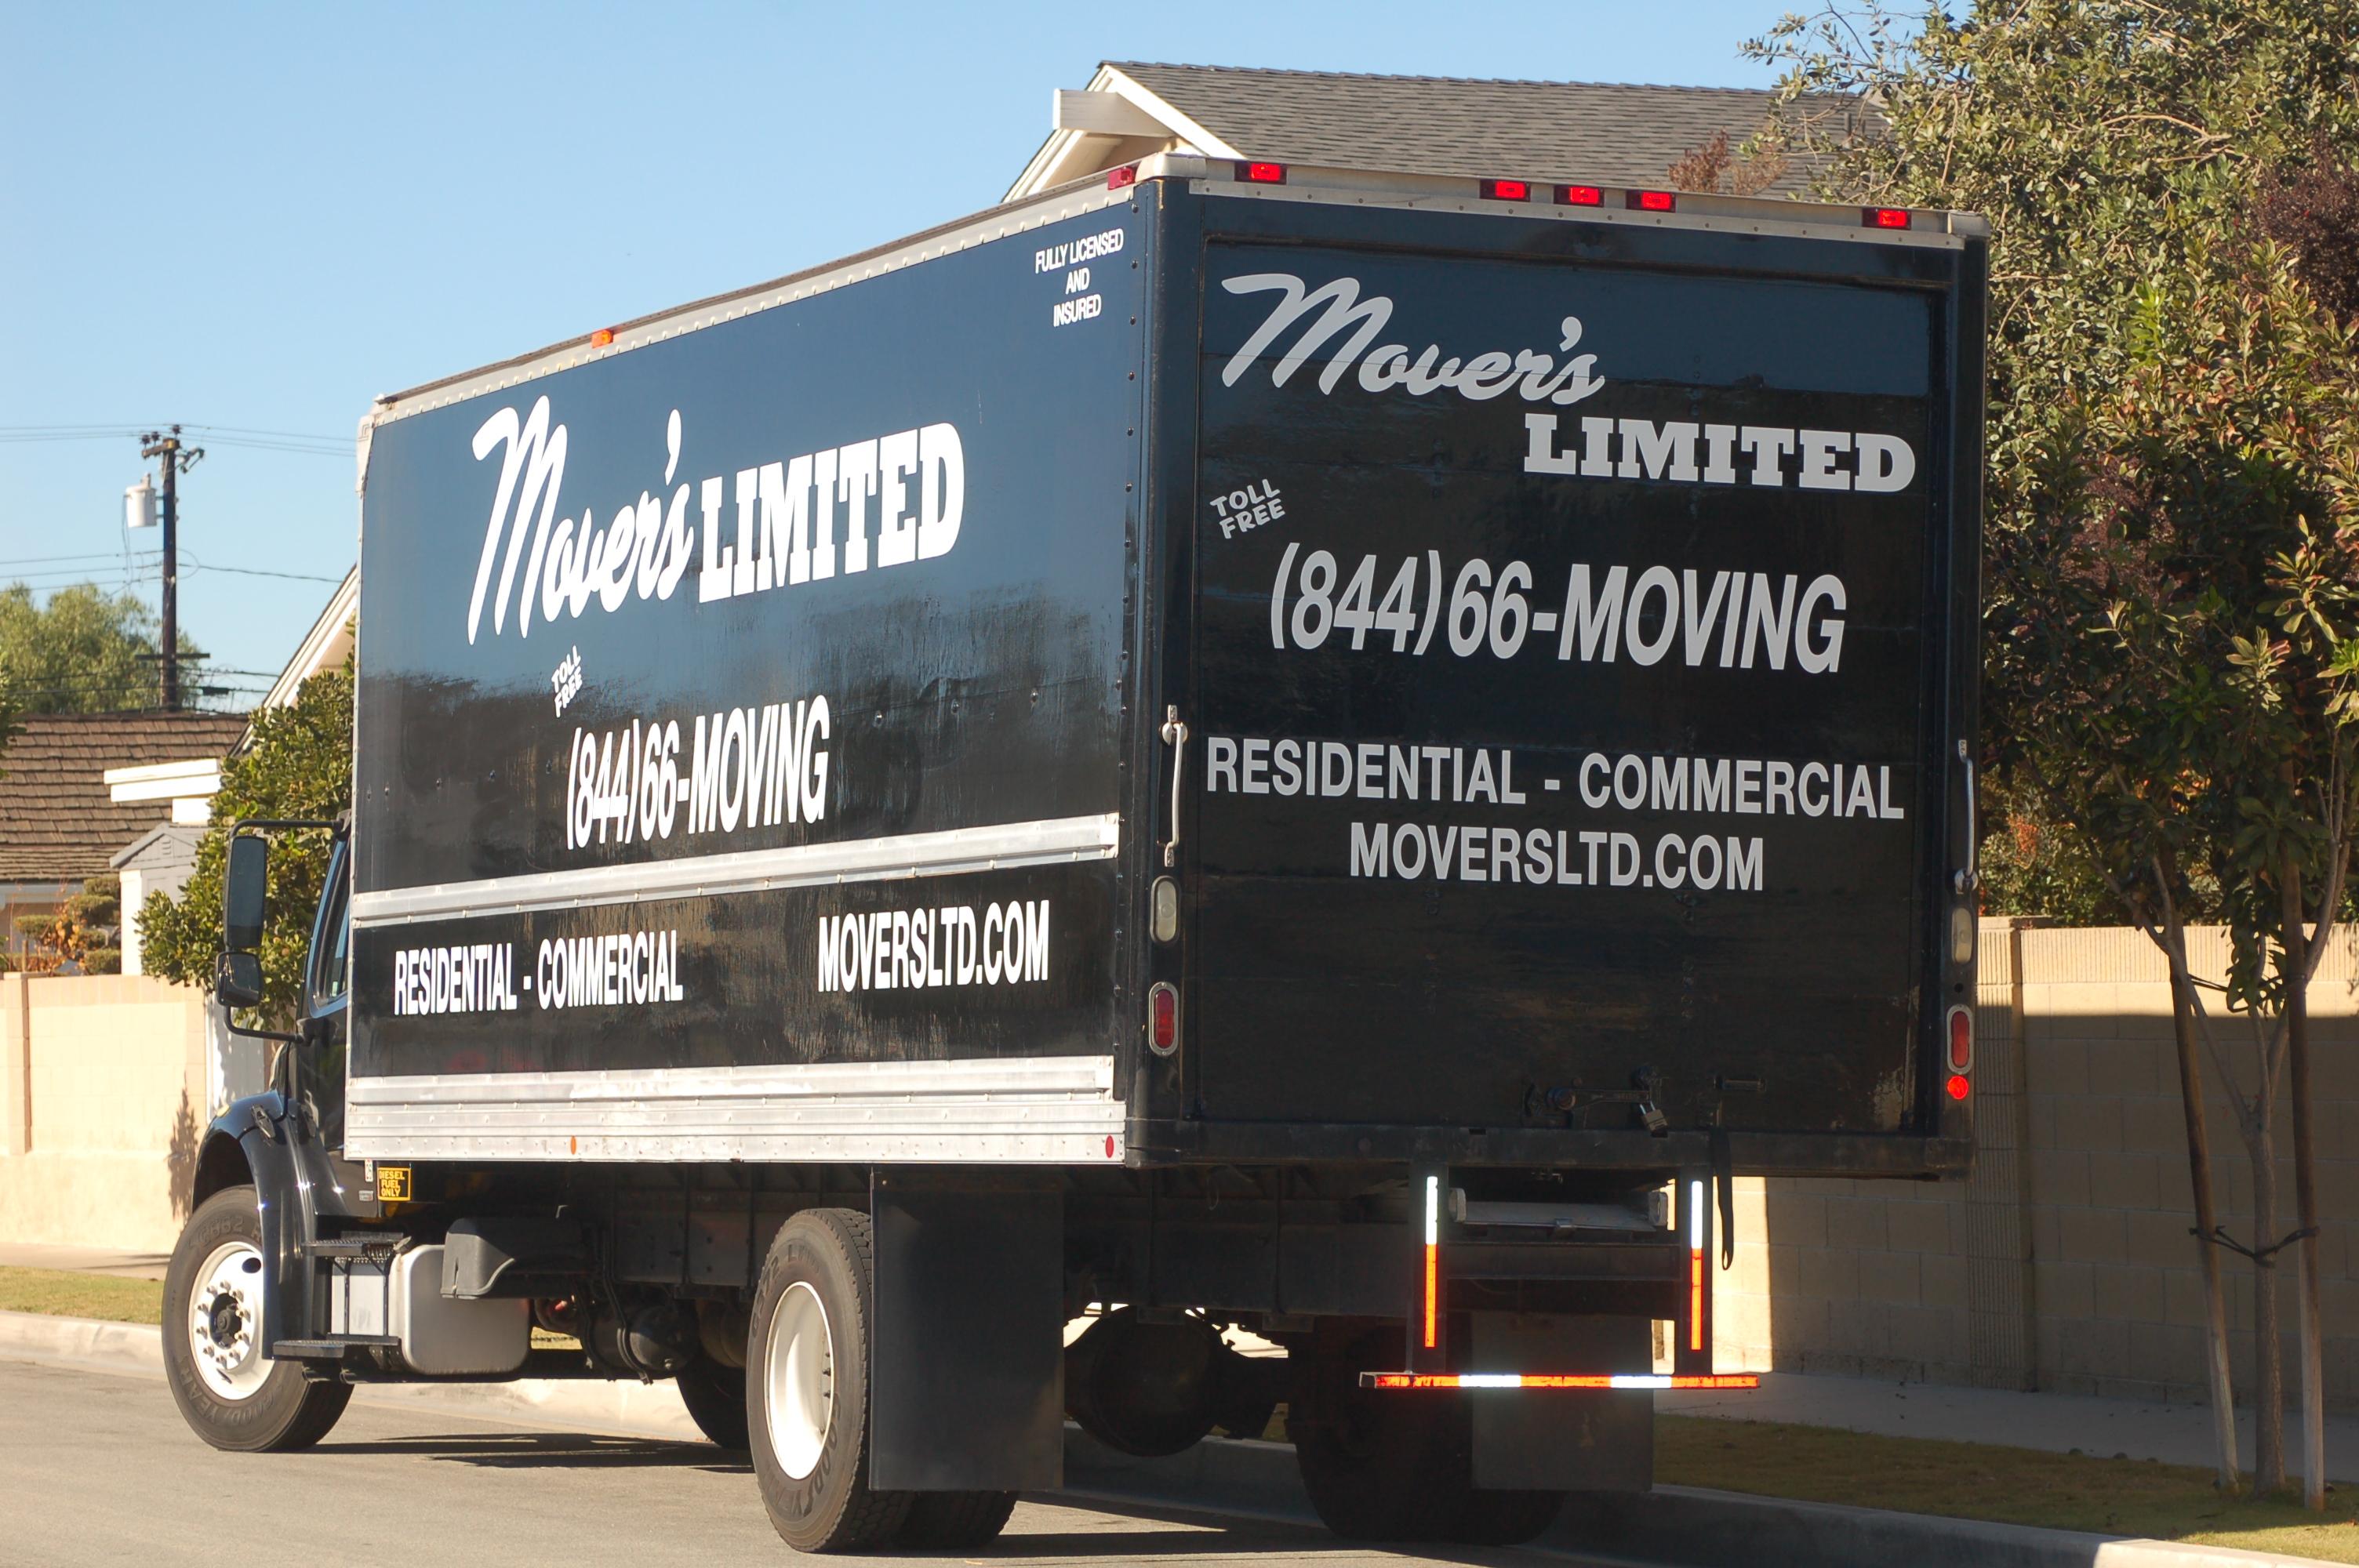 Movers Limited Huntington Beach